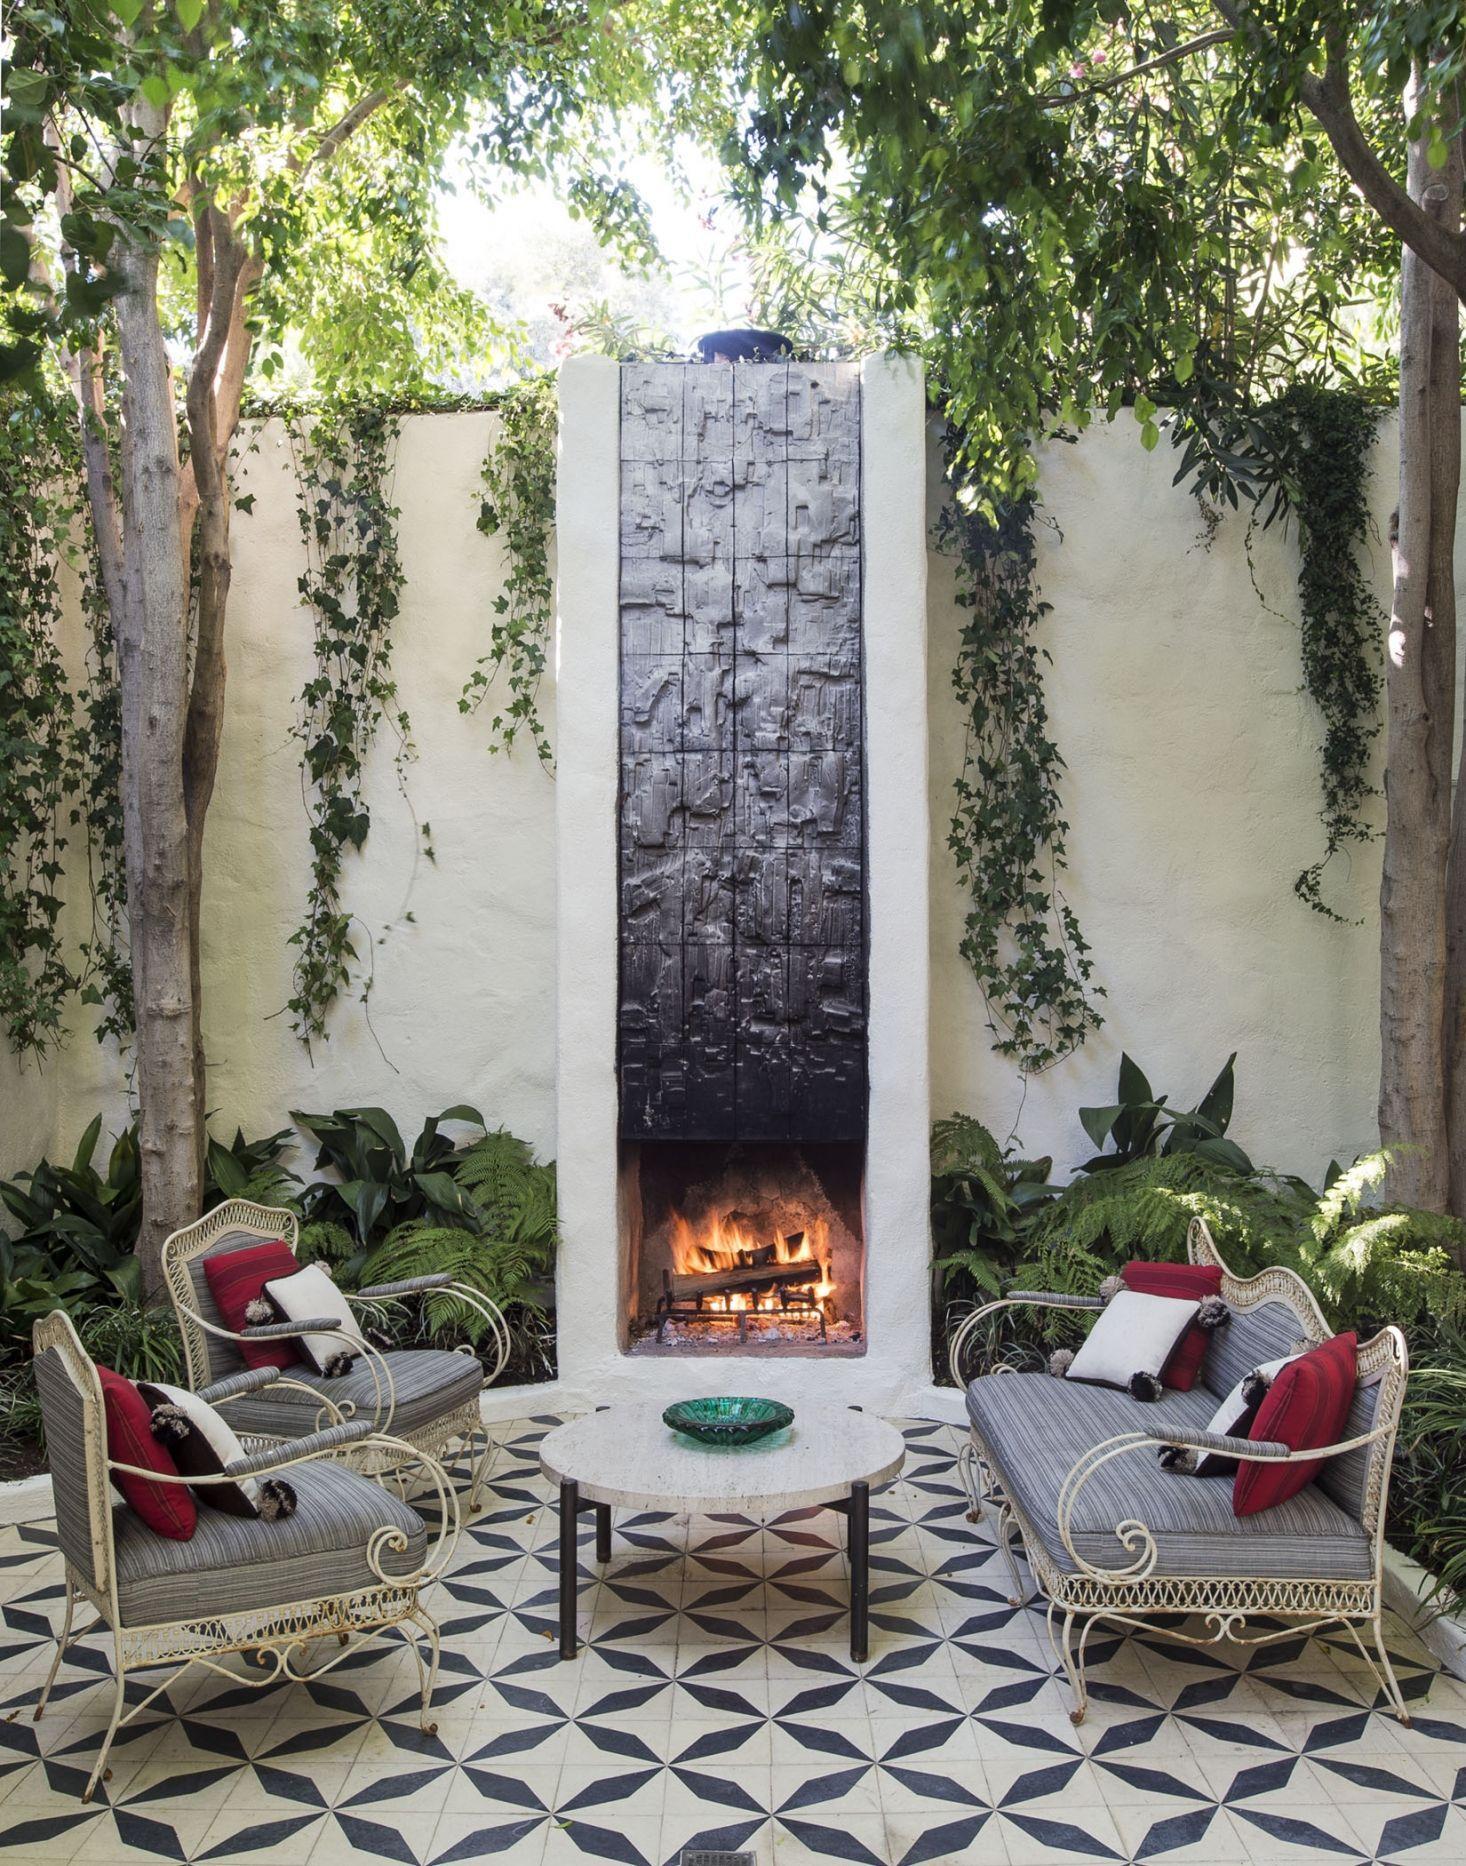 10 Ideas Para Obtener El Aspecto Maravilloso De L A De Un Disenador De Jardines Superior Gardenista In 2020 Outdoor Dekorationen Sitzgelegenheiten Im Freien Aussenkamin